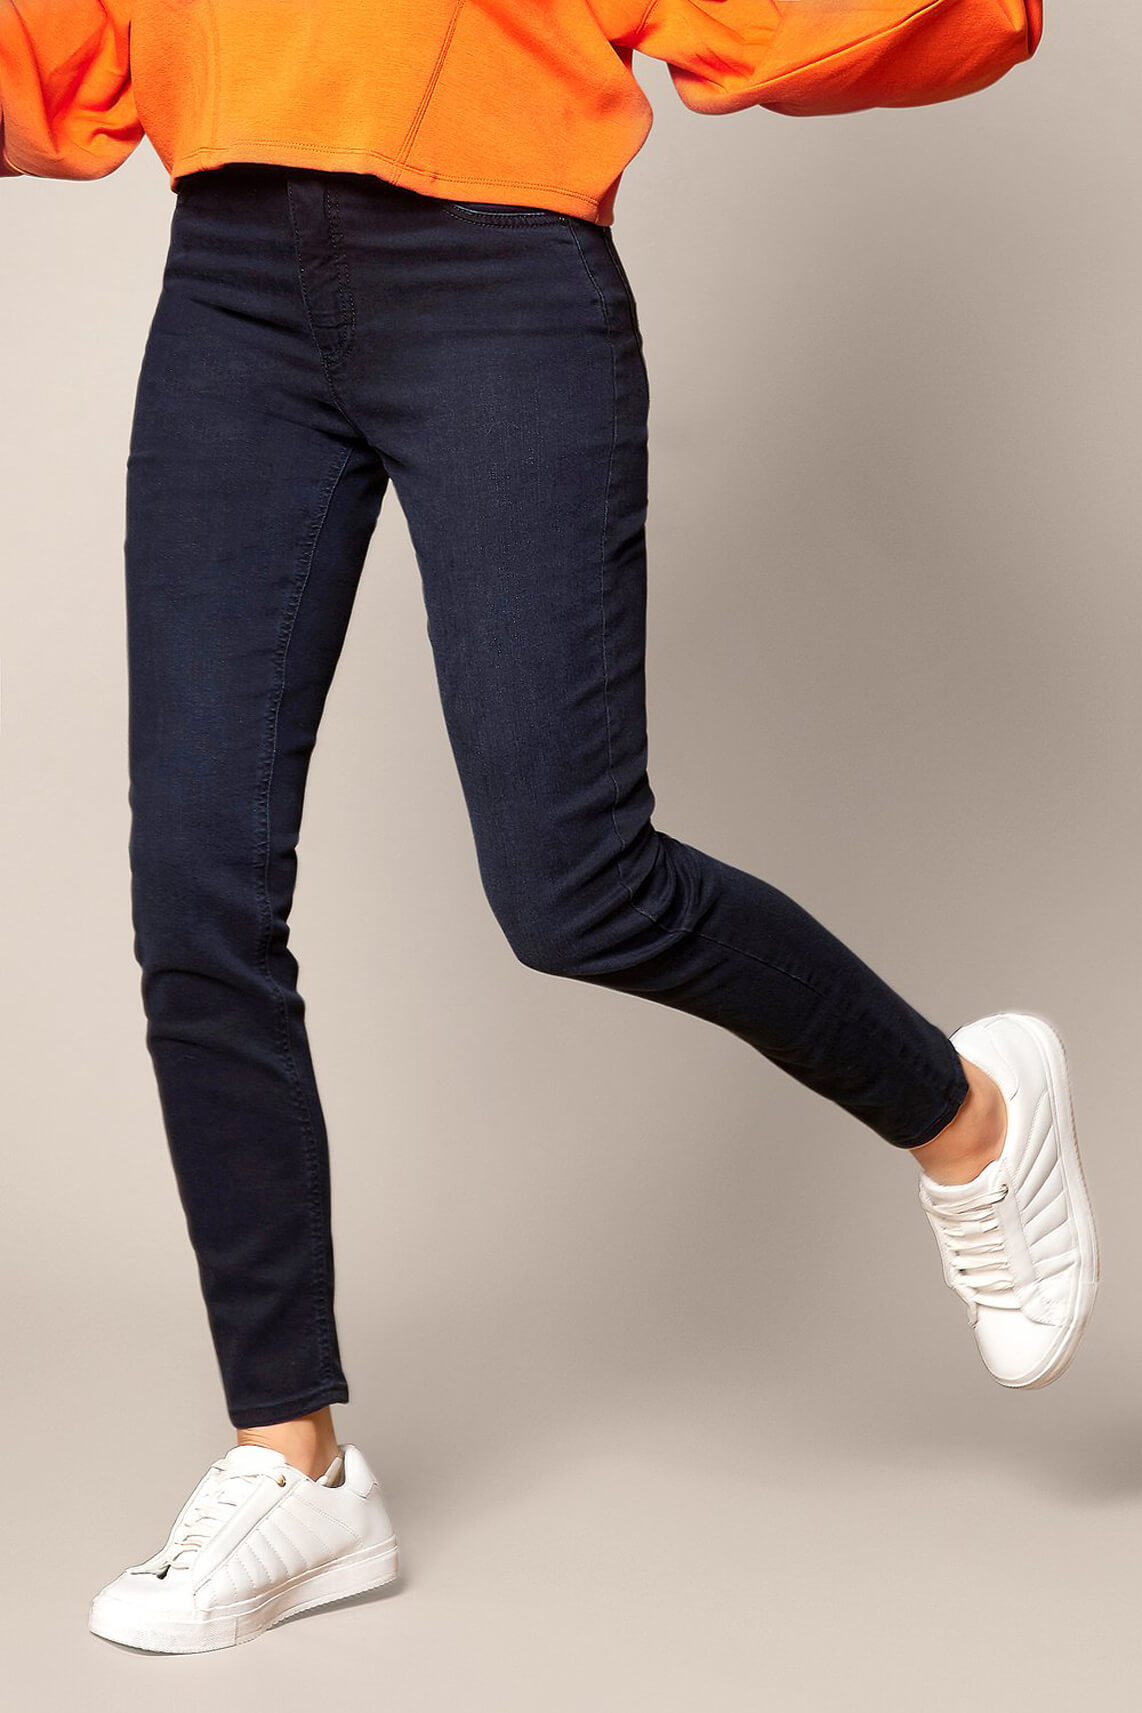 Rosner Dames L32 Audrey bodyshaping jeans Blauw